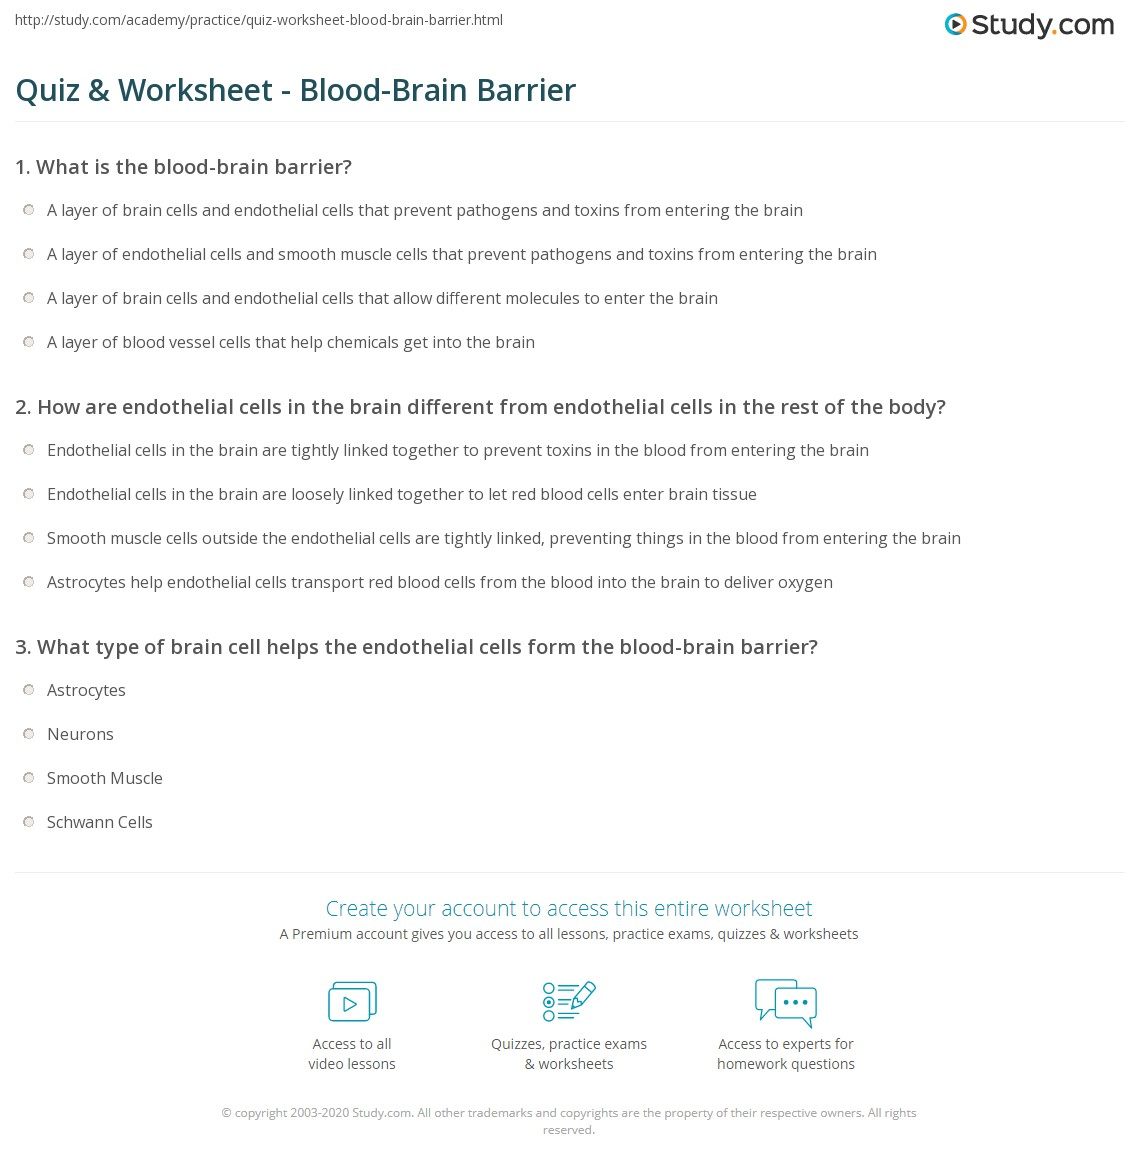 Quiz & Worksheet - Blood-Brain Barrier | Study.com